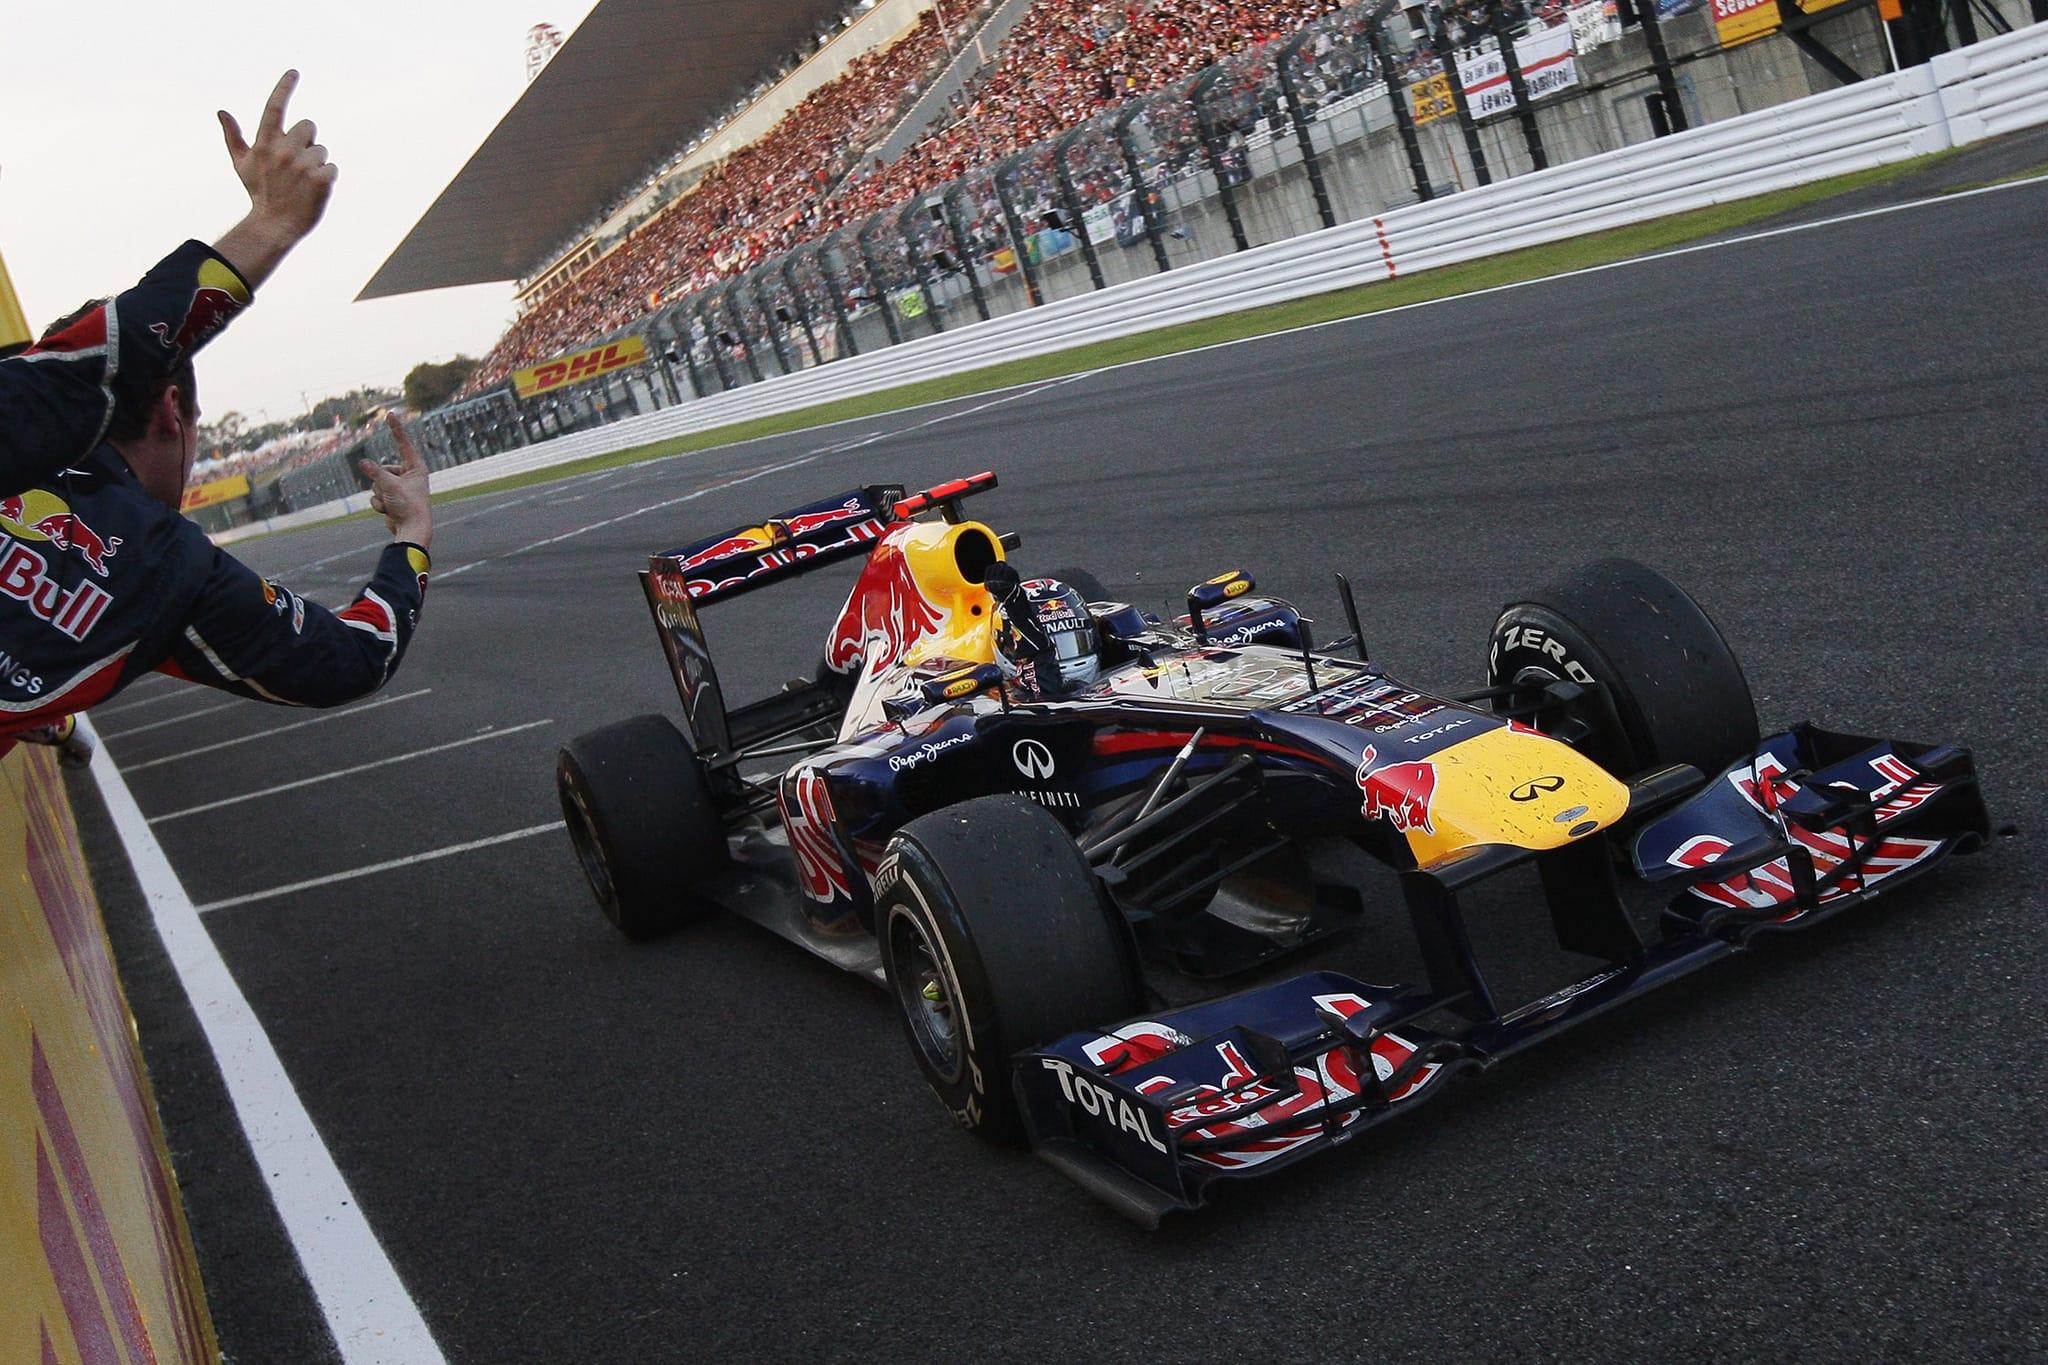 Liam Lawson to drive F1 car